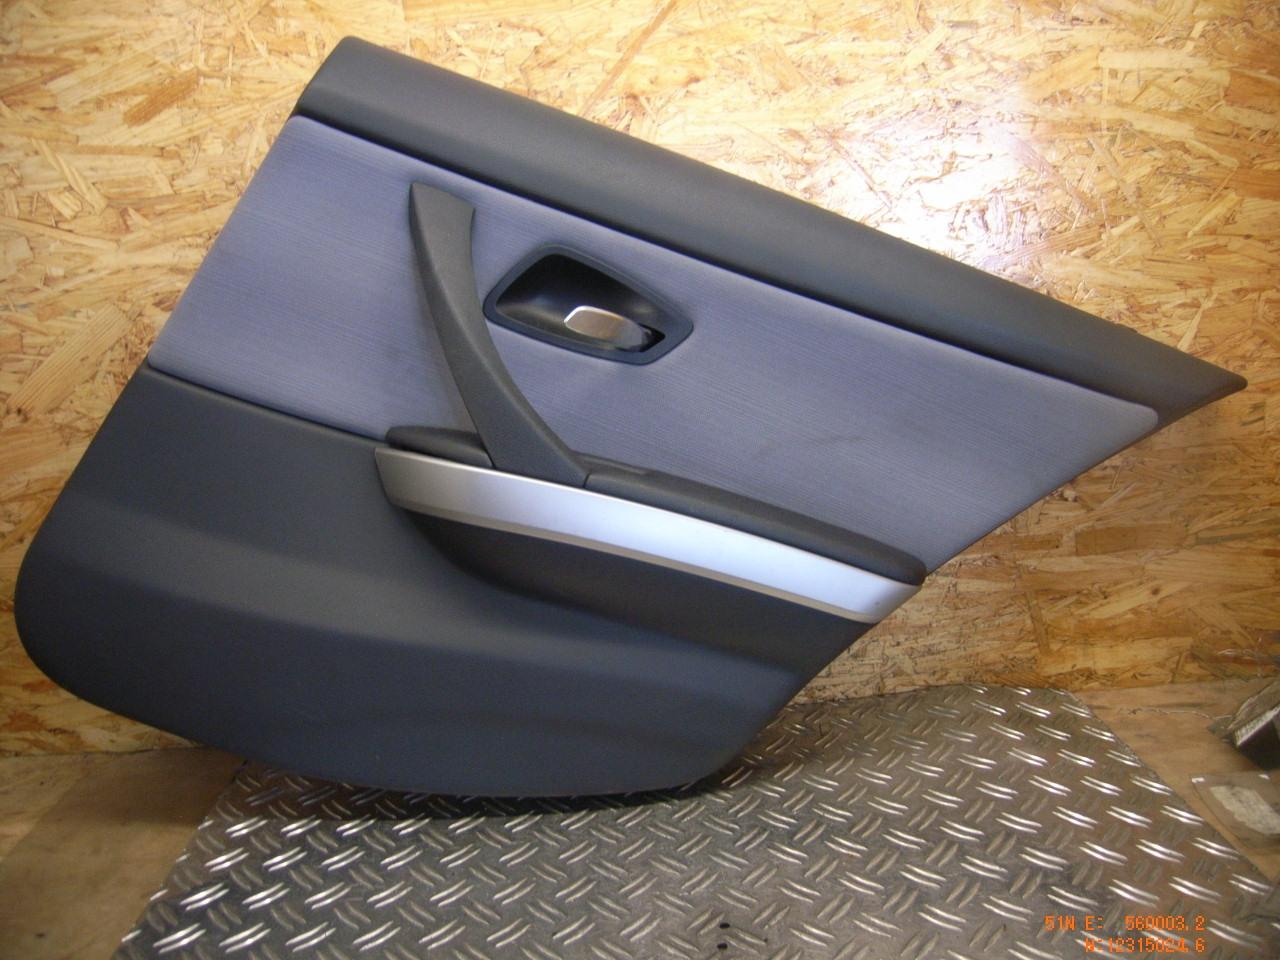 445911 t rverkleidung rechts hinten bmw 3er e90 ebay. Black Bedroom Furniture Sets. Home Design Ideas